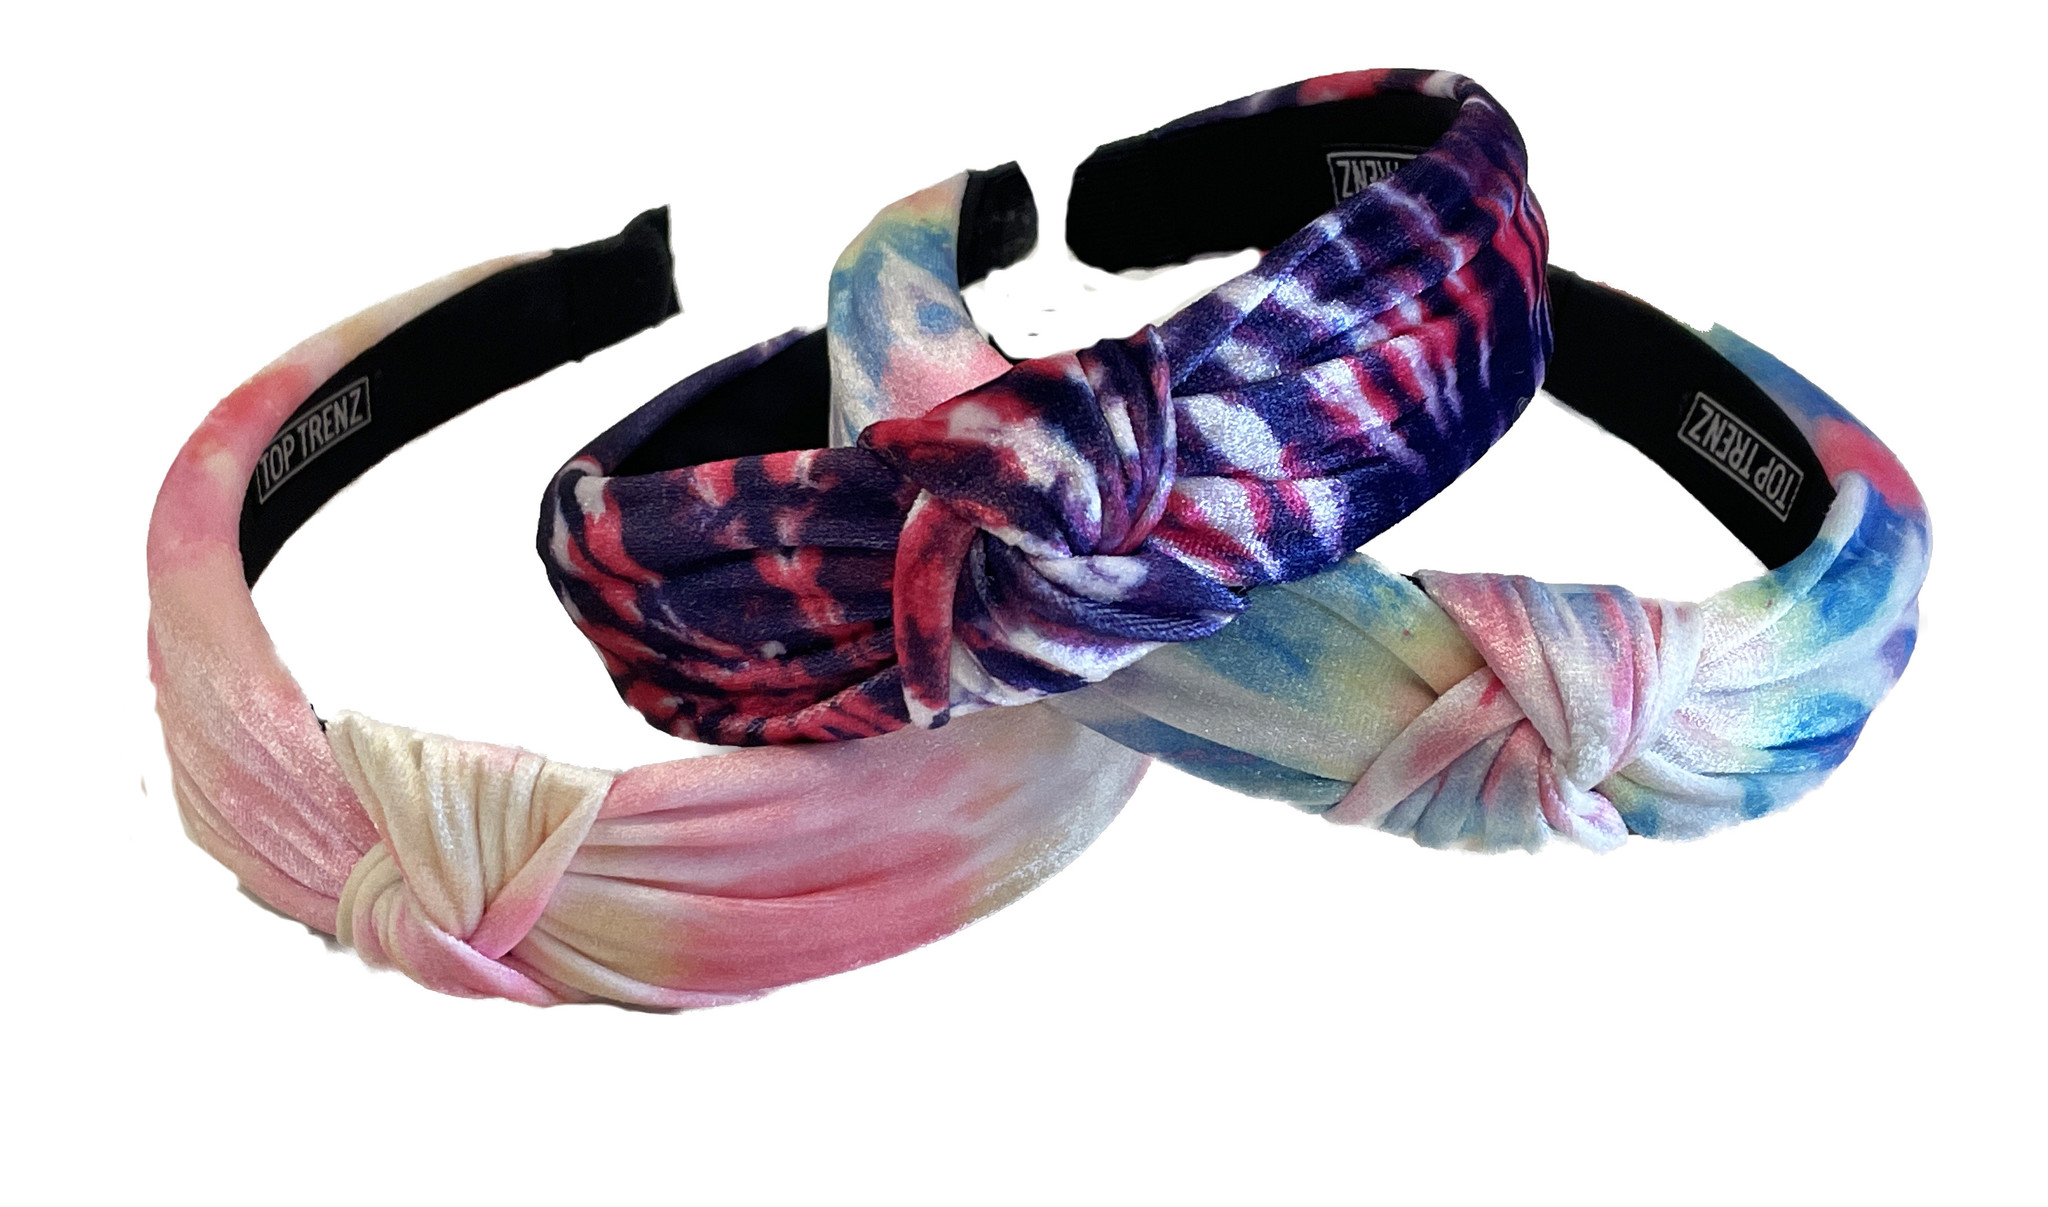 New Tie Dye Knot Headbands - 4 options